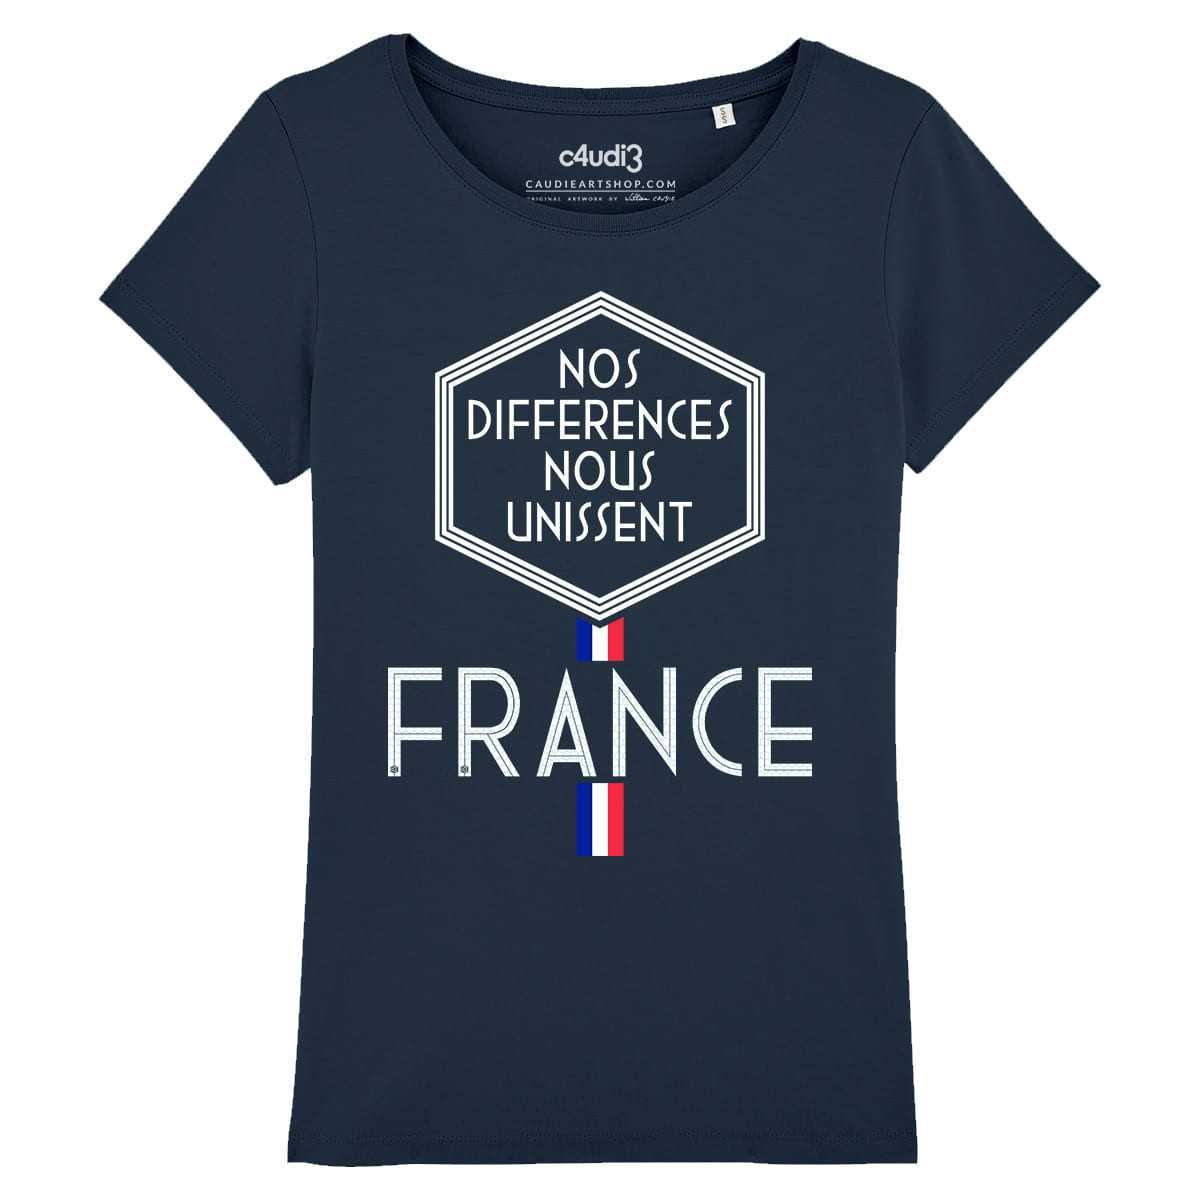 NOS DIFFERENCES NOUS UNISSENT - Women's tee-shirt - Caudie